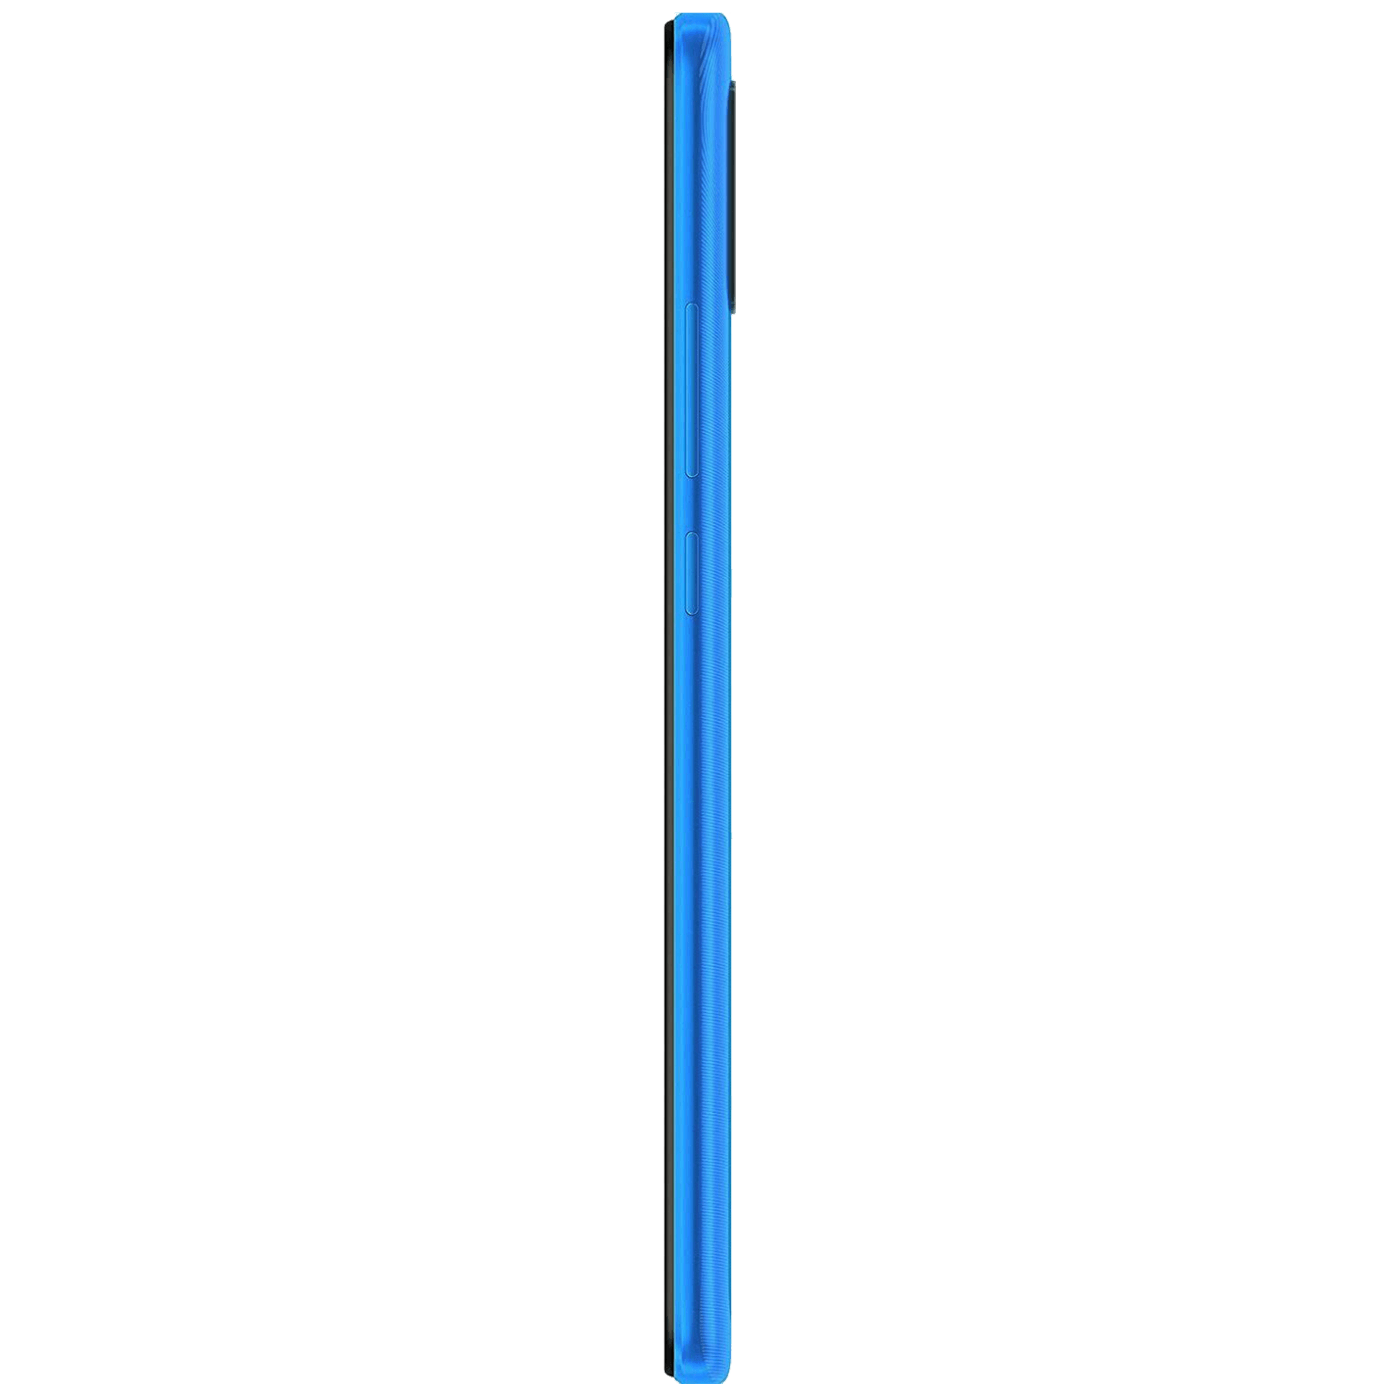 Redmi 9A 2GB/32GB Blue